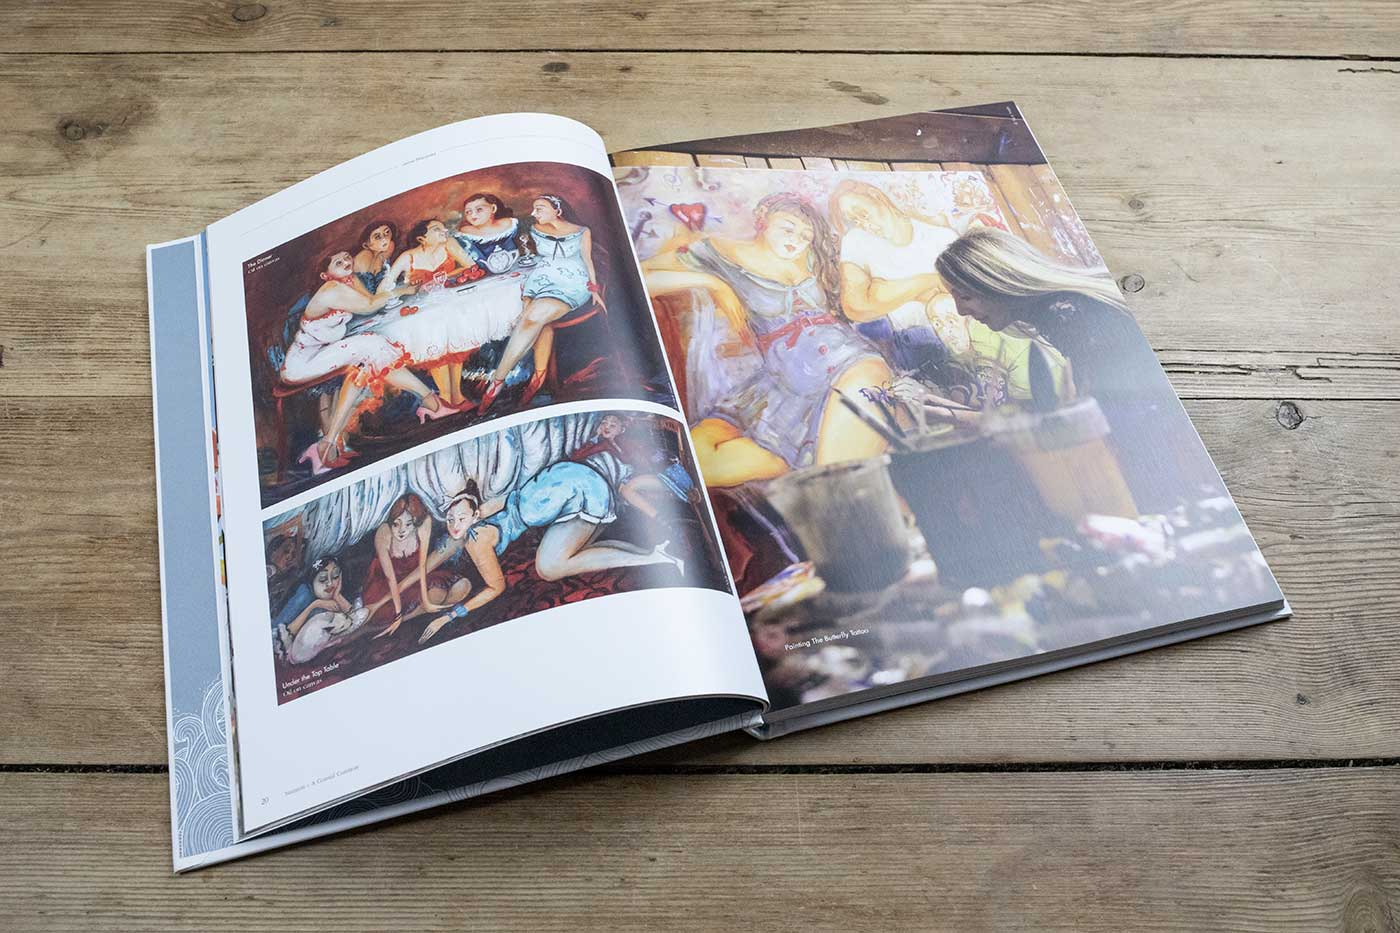 Saunton Sands Hotel book